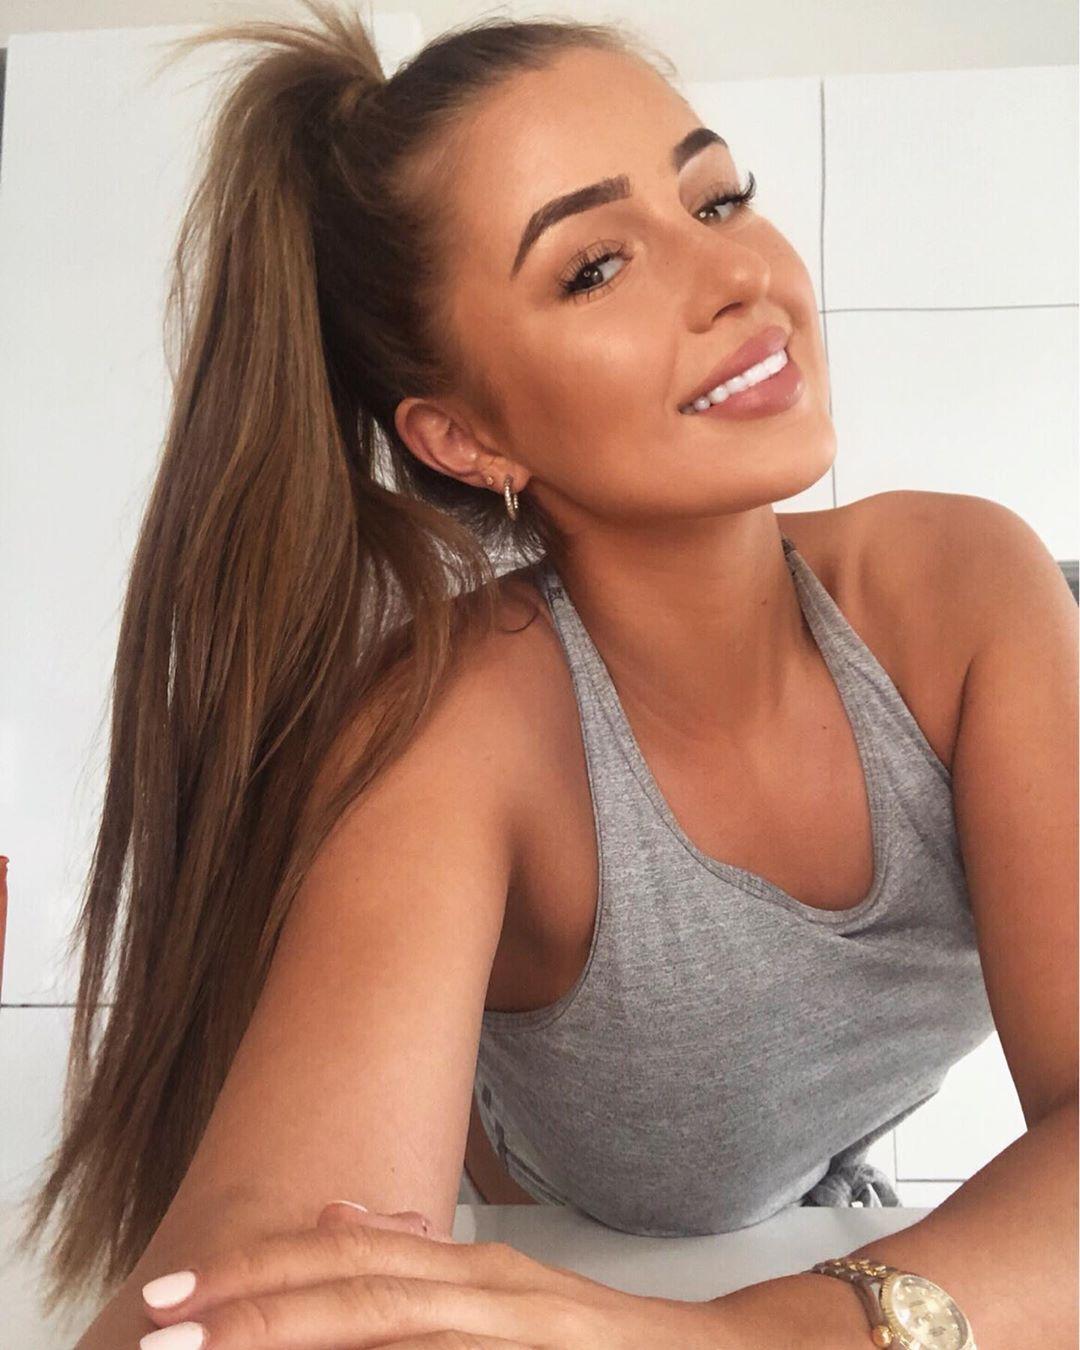 "Georgia Steel on Instagram: ""A little selfie never harmed anyone 🤪"""